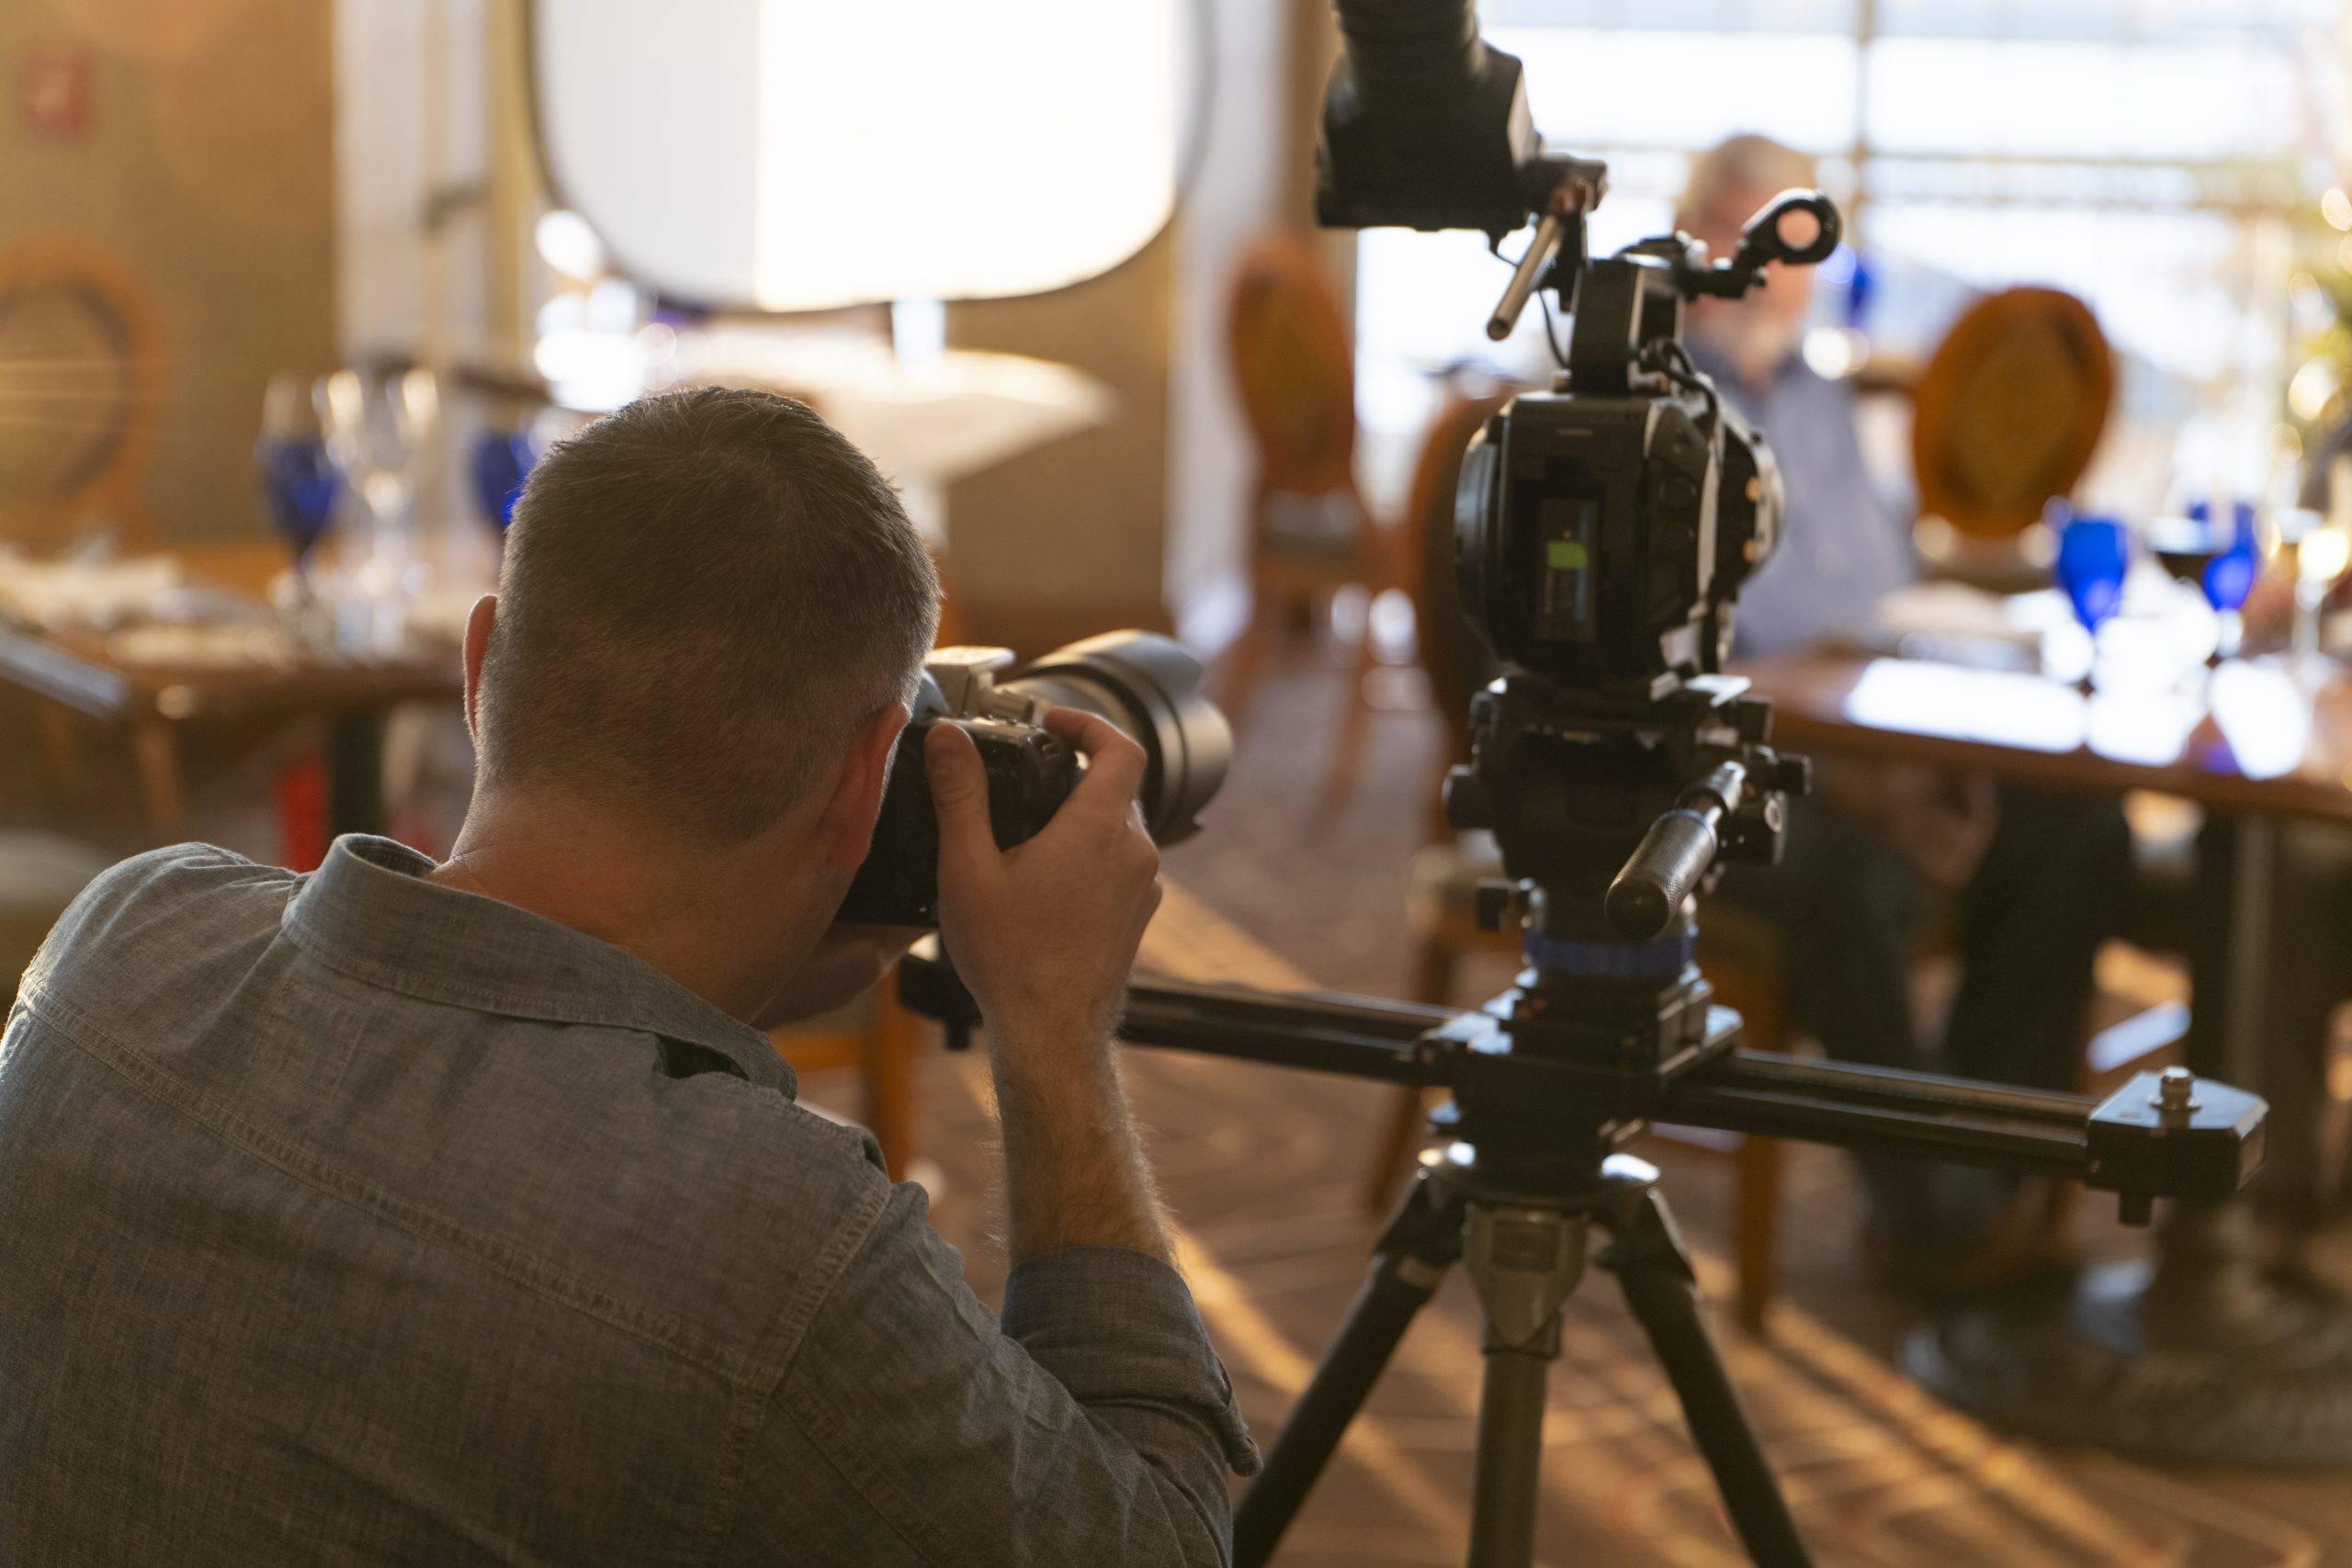 Travel & Tourism: Creating a STUNNING Resort Video, Part 1